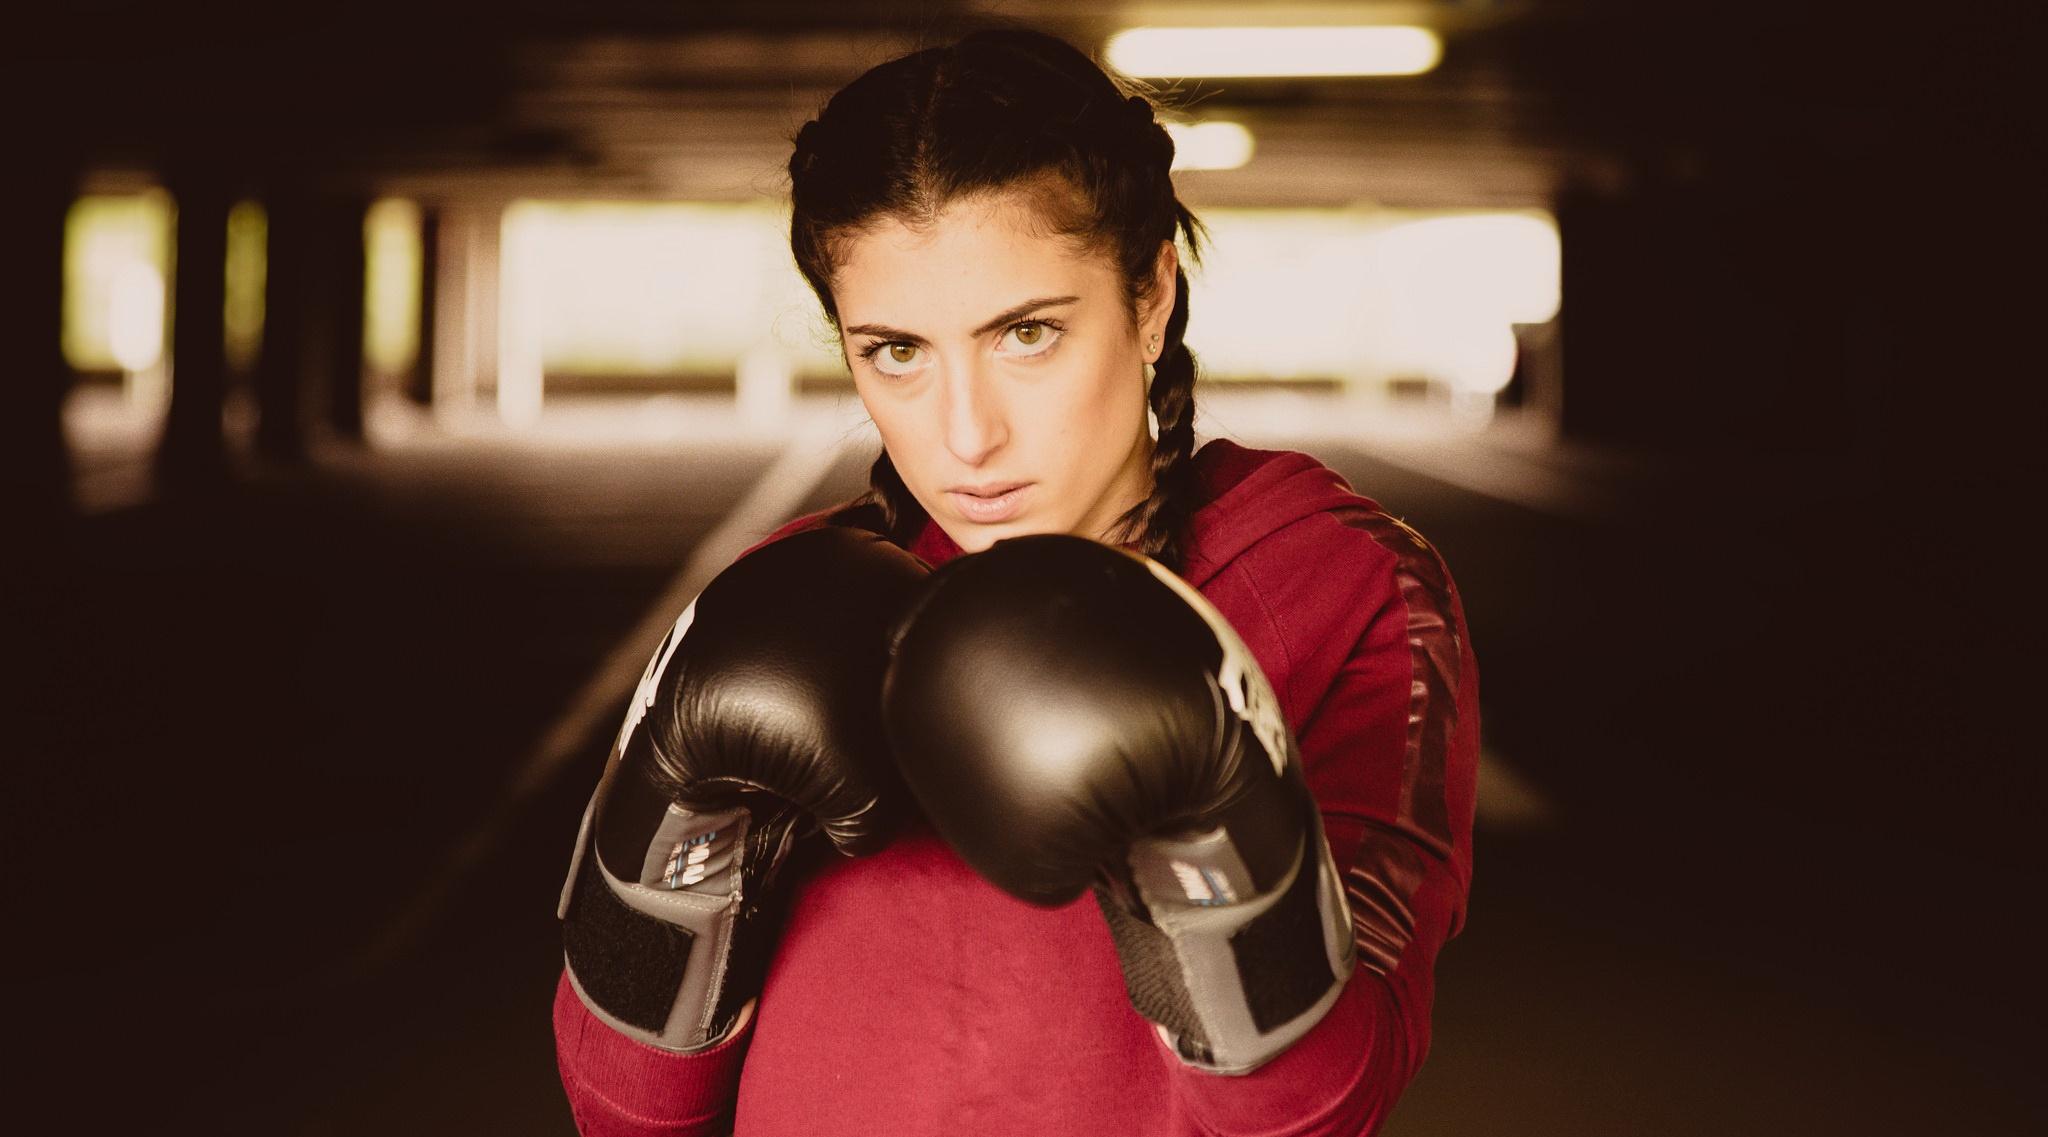 Boxing: Girl, Brown Eyes, Brunette, Woman, Depth Of Field, Braid, Boxing